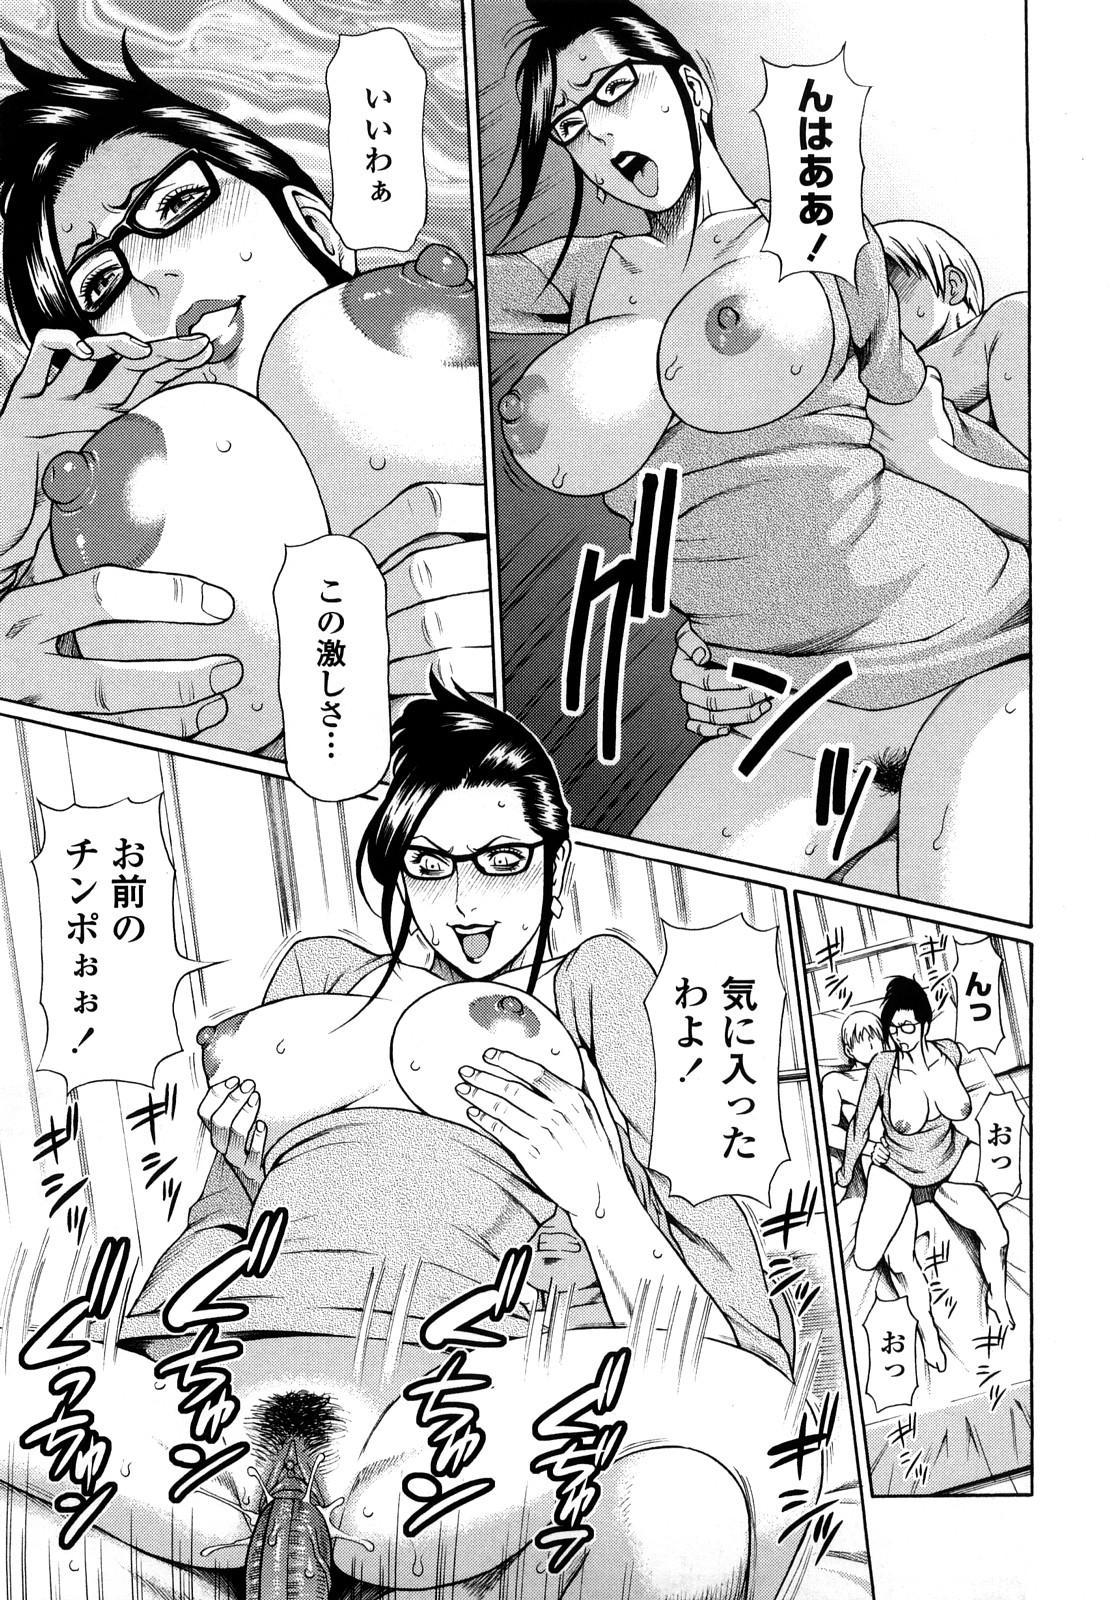 [Takasugi Kou] Kindan no Haha-Ana - Immorality Love-Hole [Decensored] 170